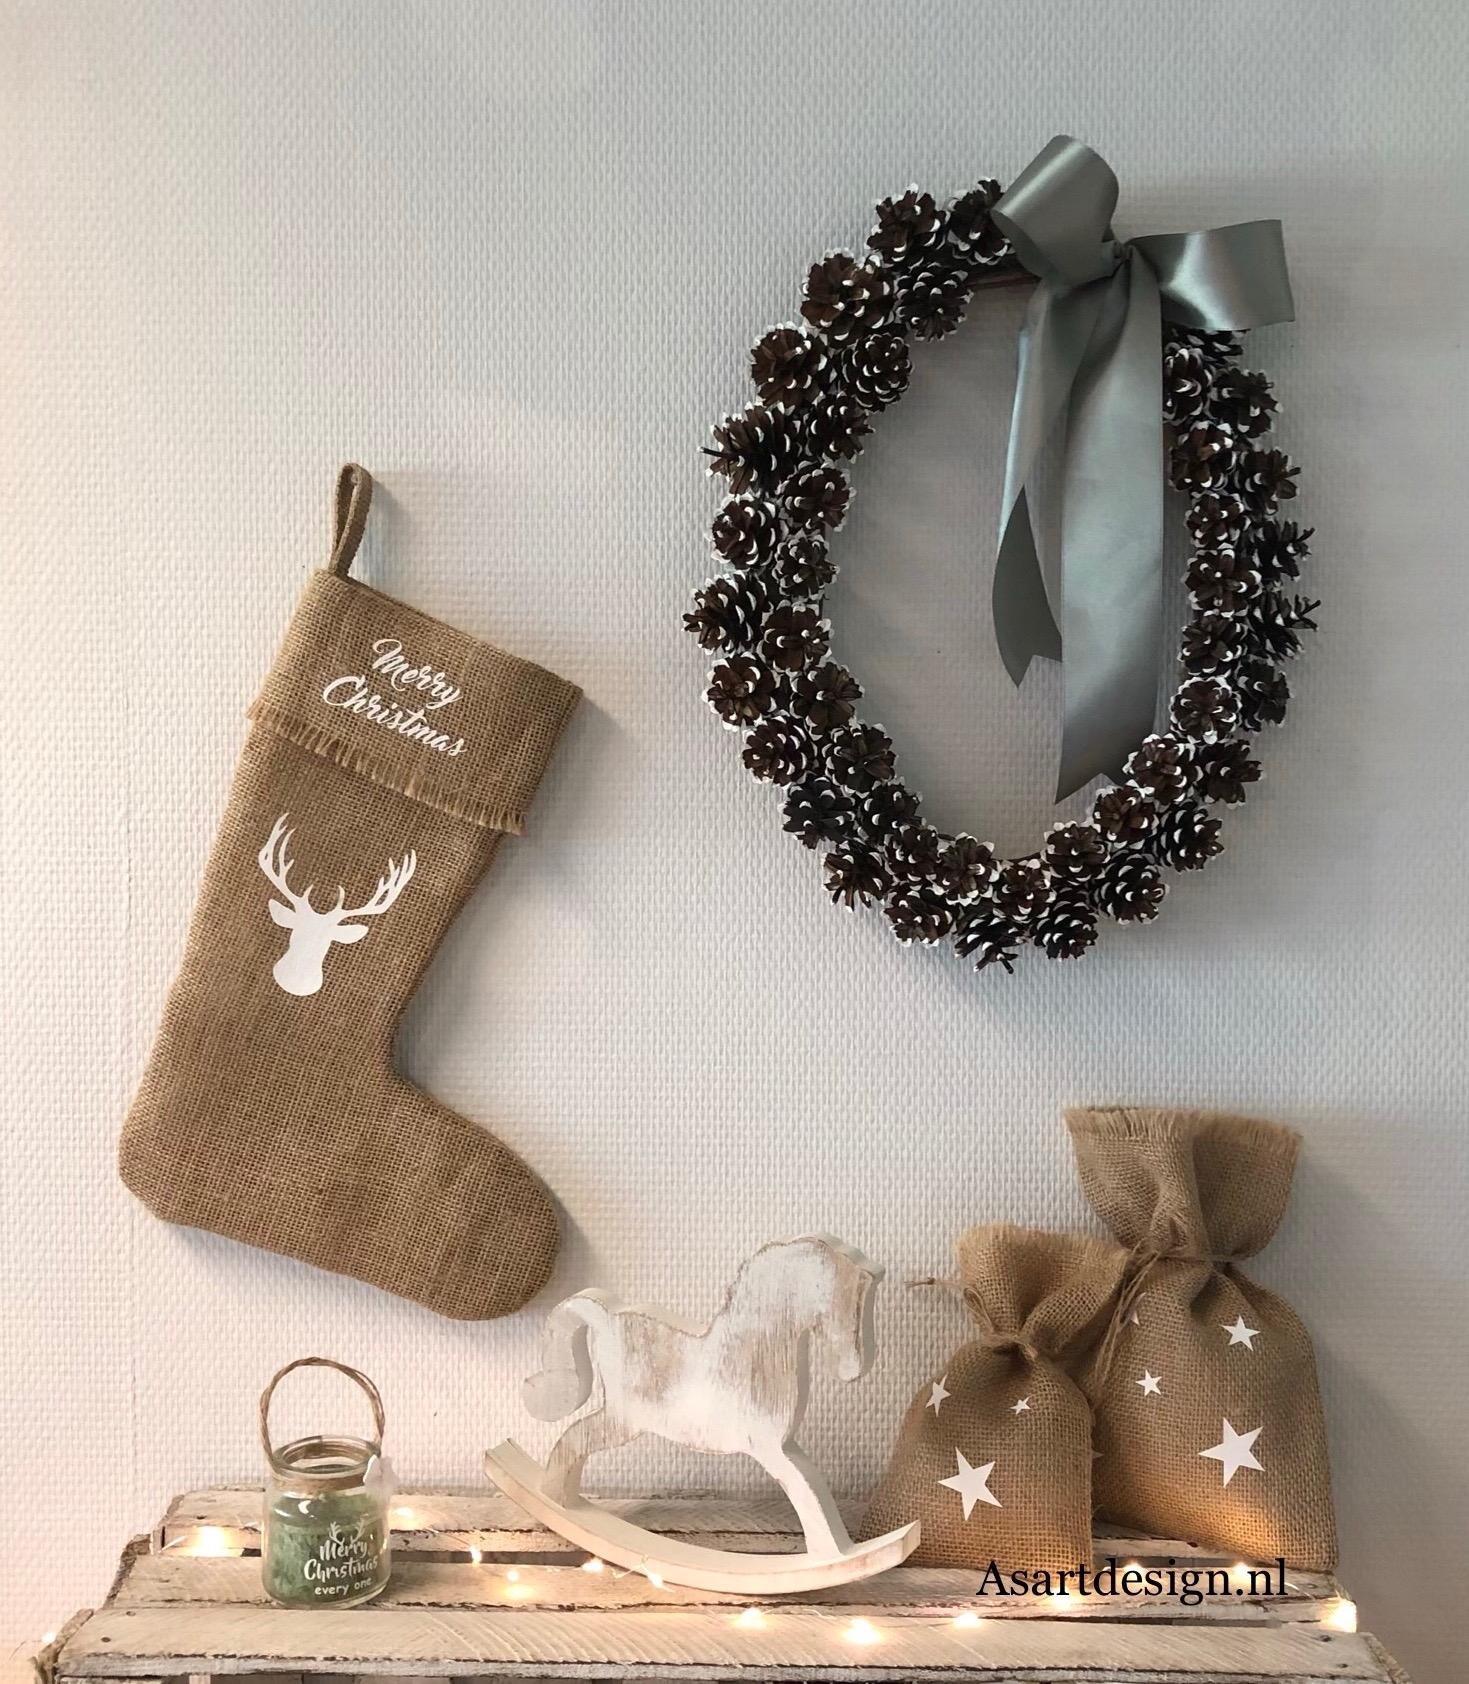 Kerstdecoratie | Jute kerstsok 'Merry christmas'